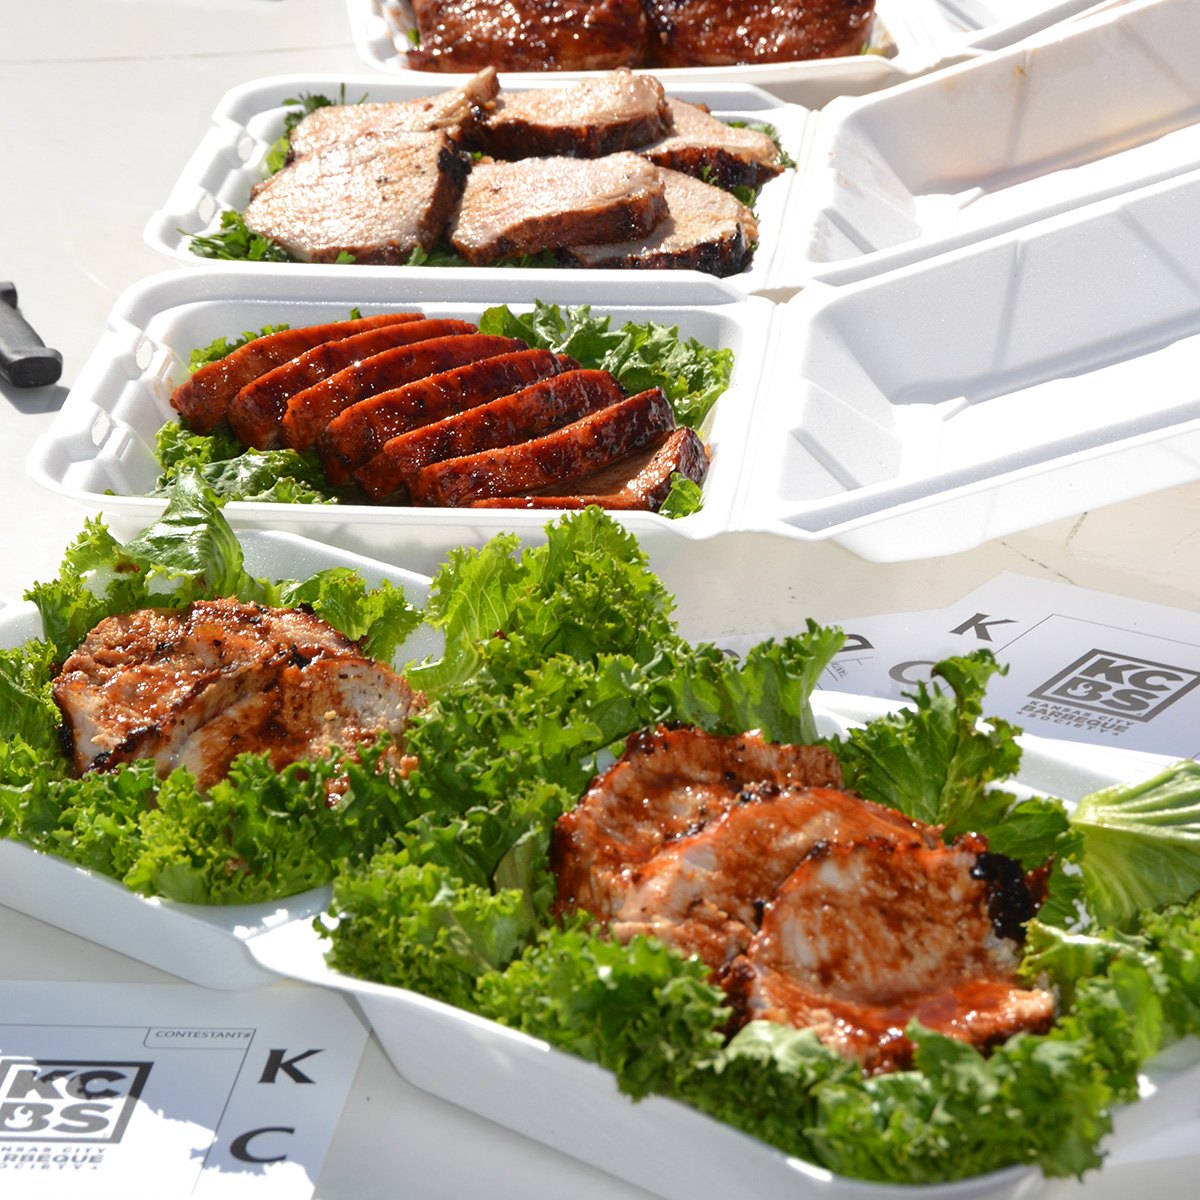 extended stay america celebrates kansas city with stay saucy kc